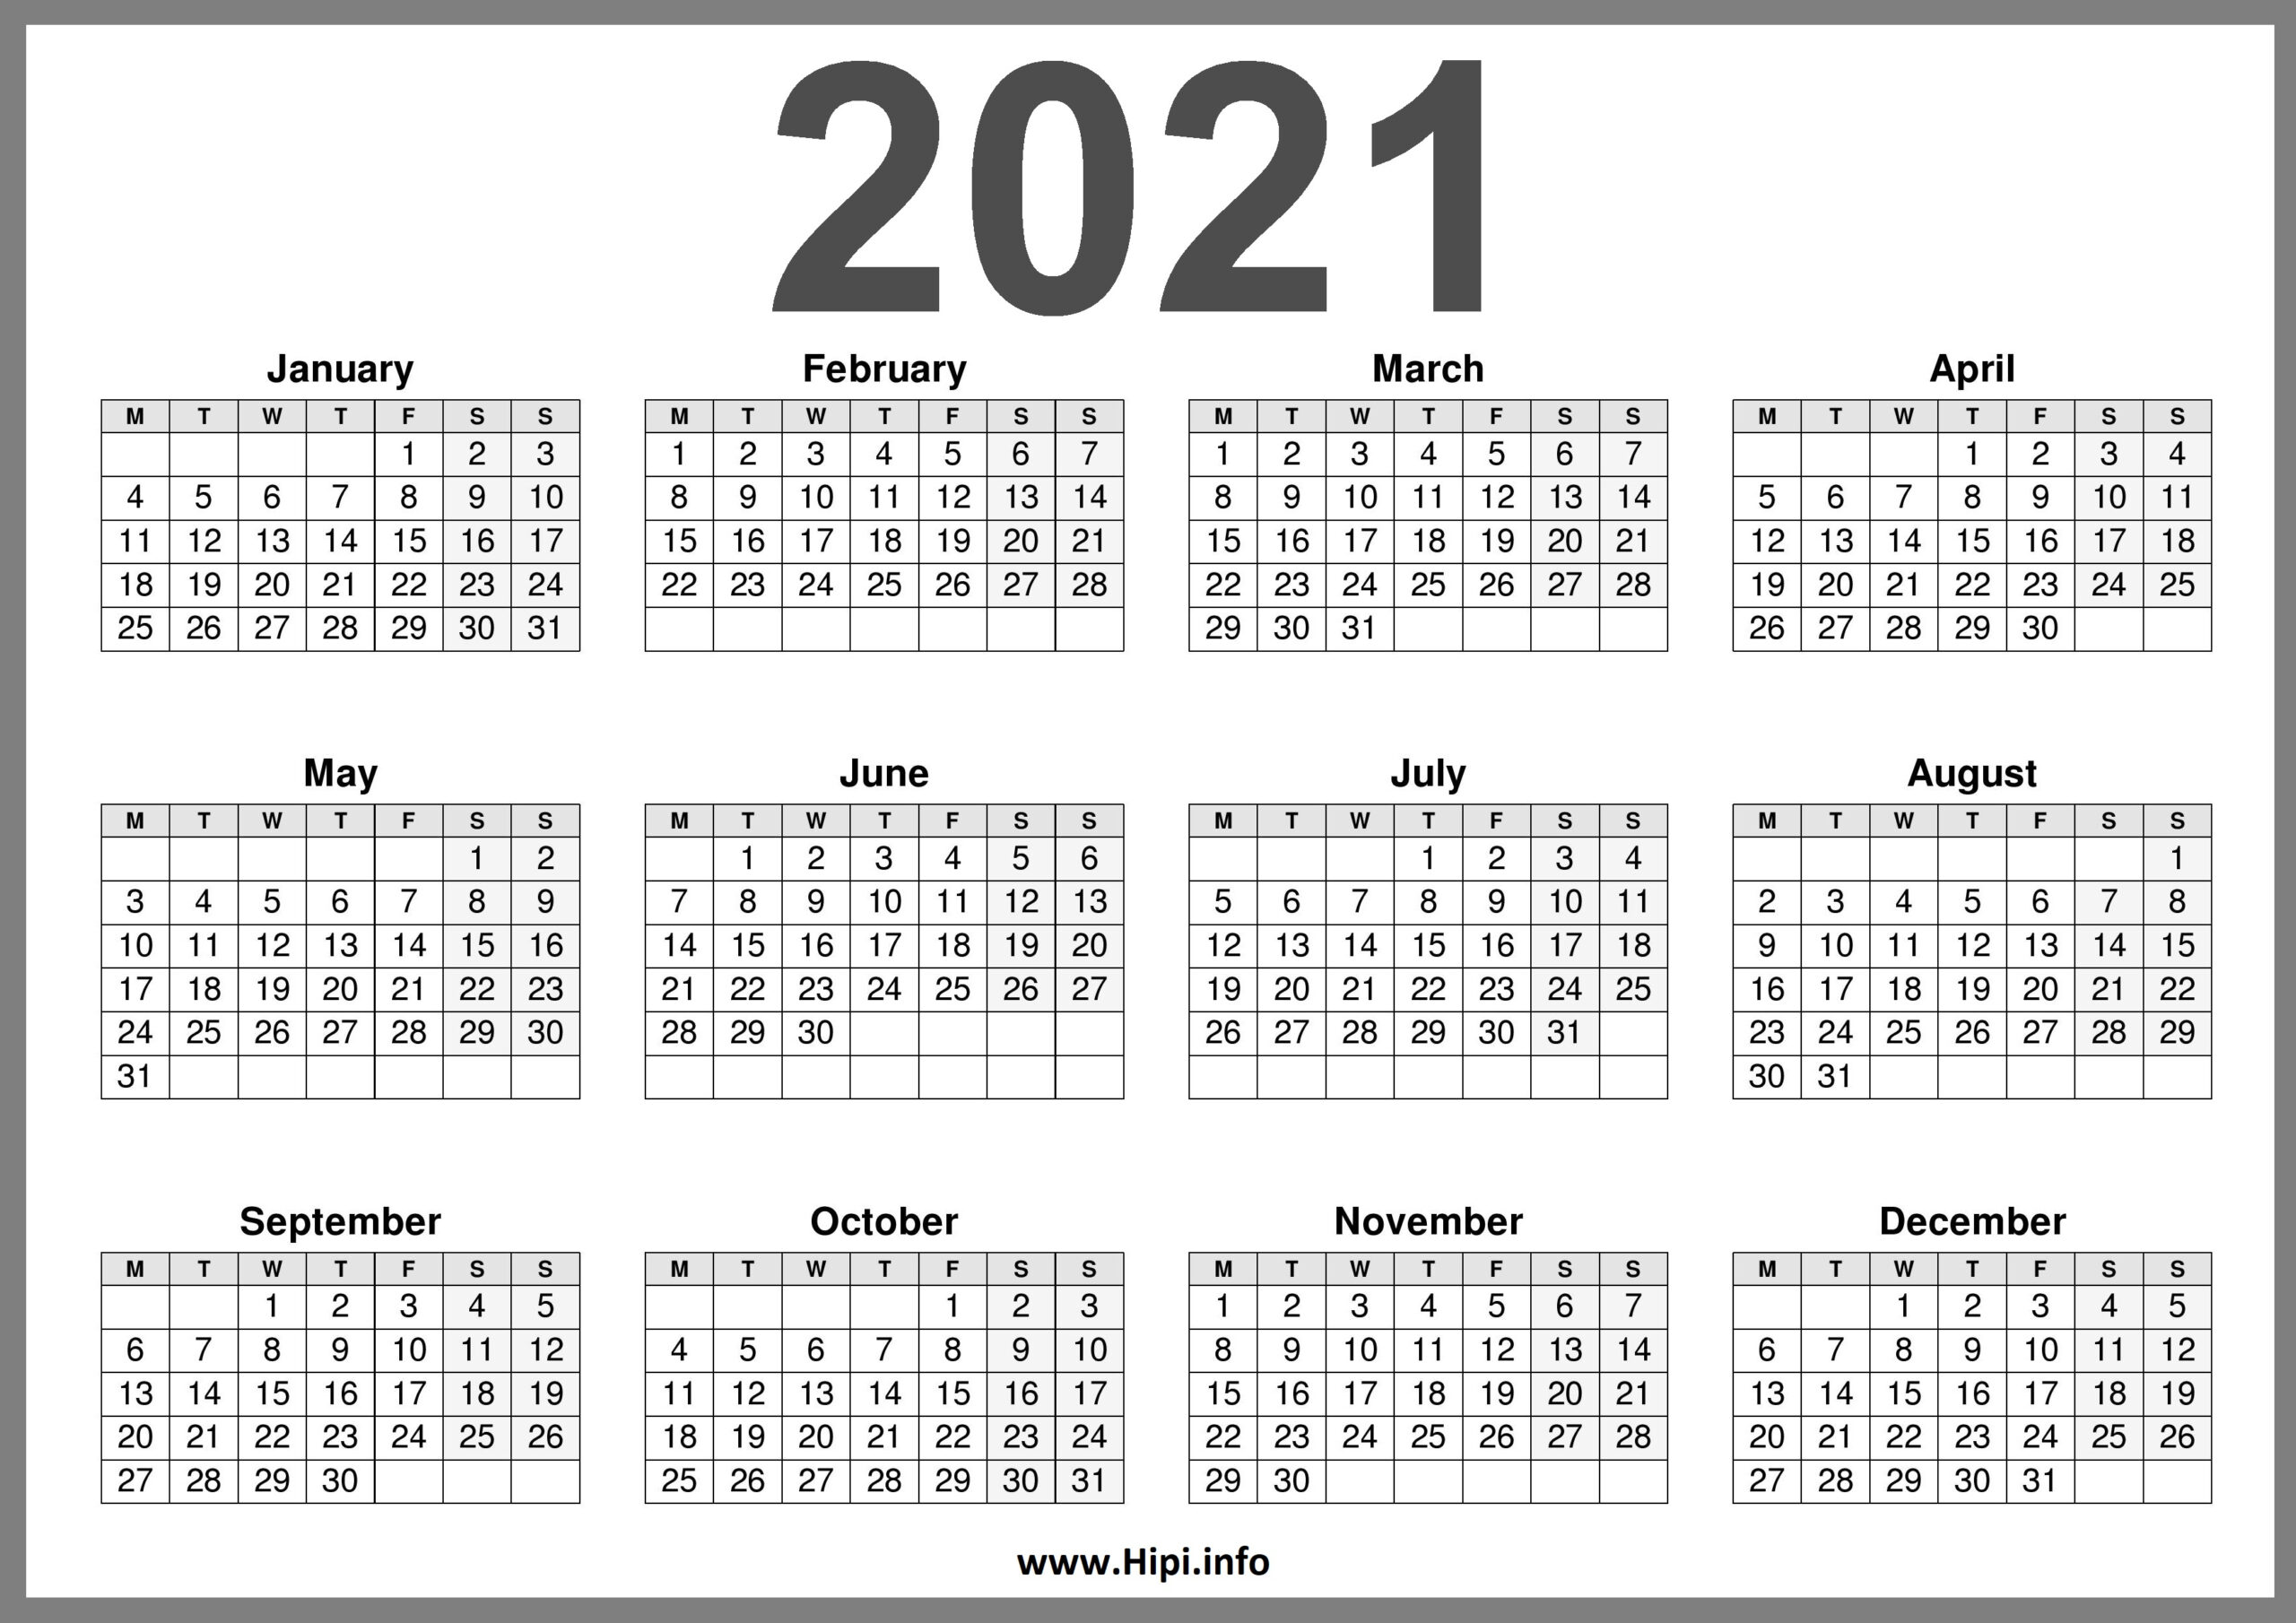 2021 Printable Calendar (Uk) United Kingdom - Hipi